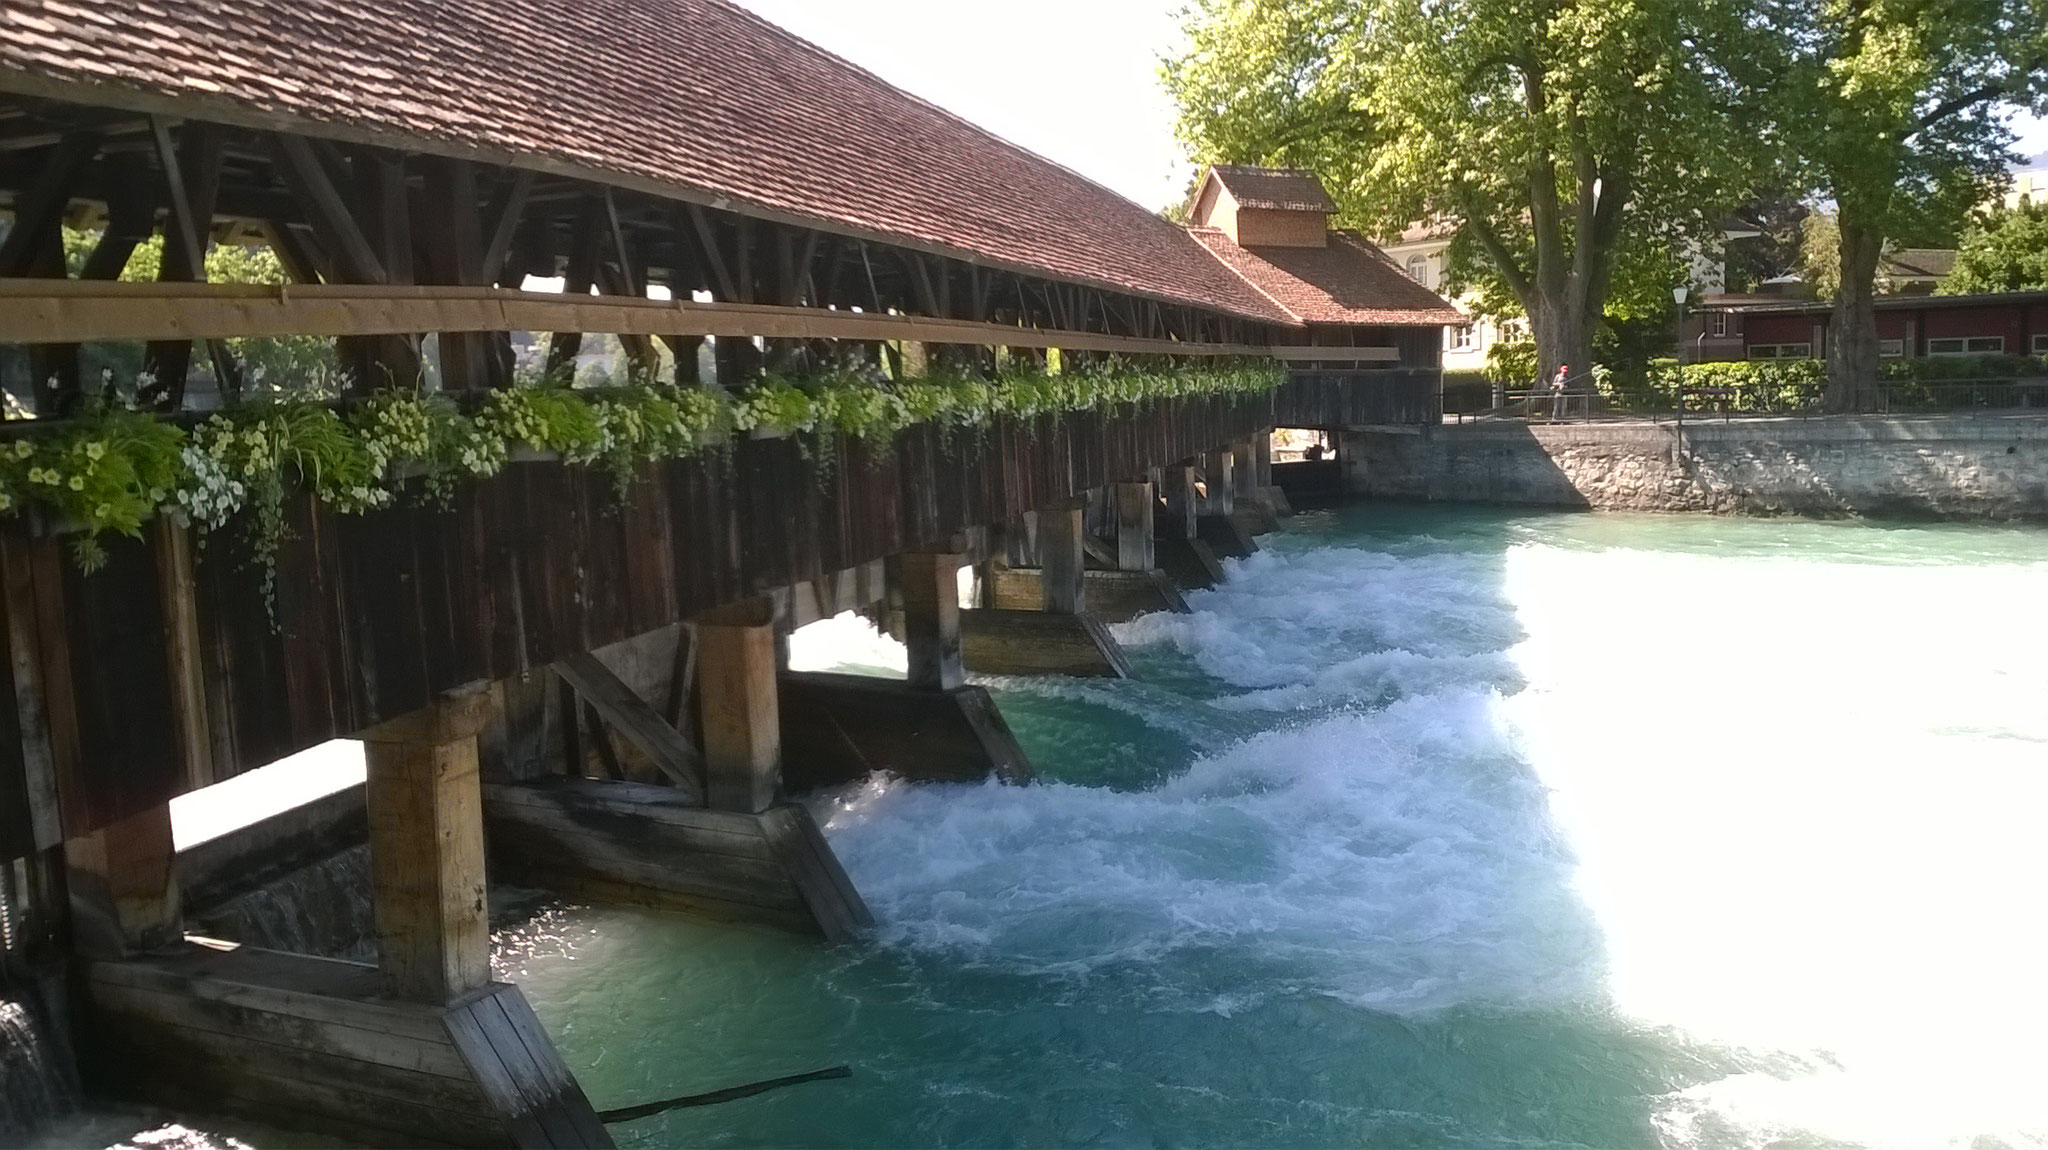 Mühlebrücke